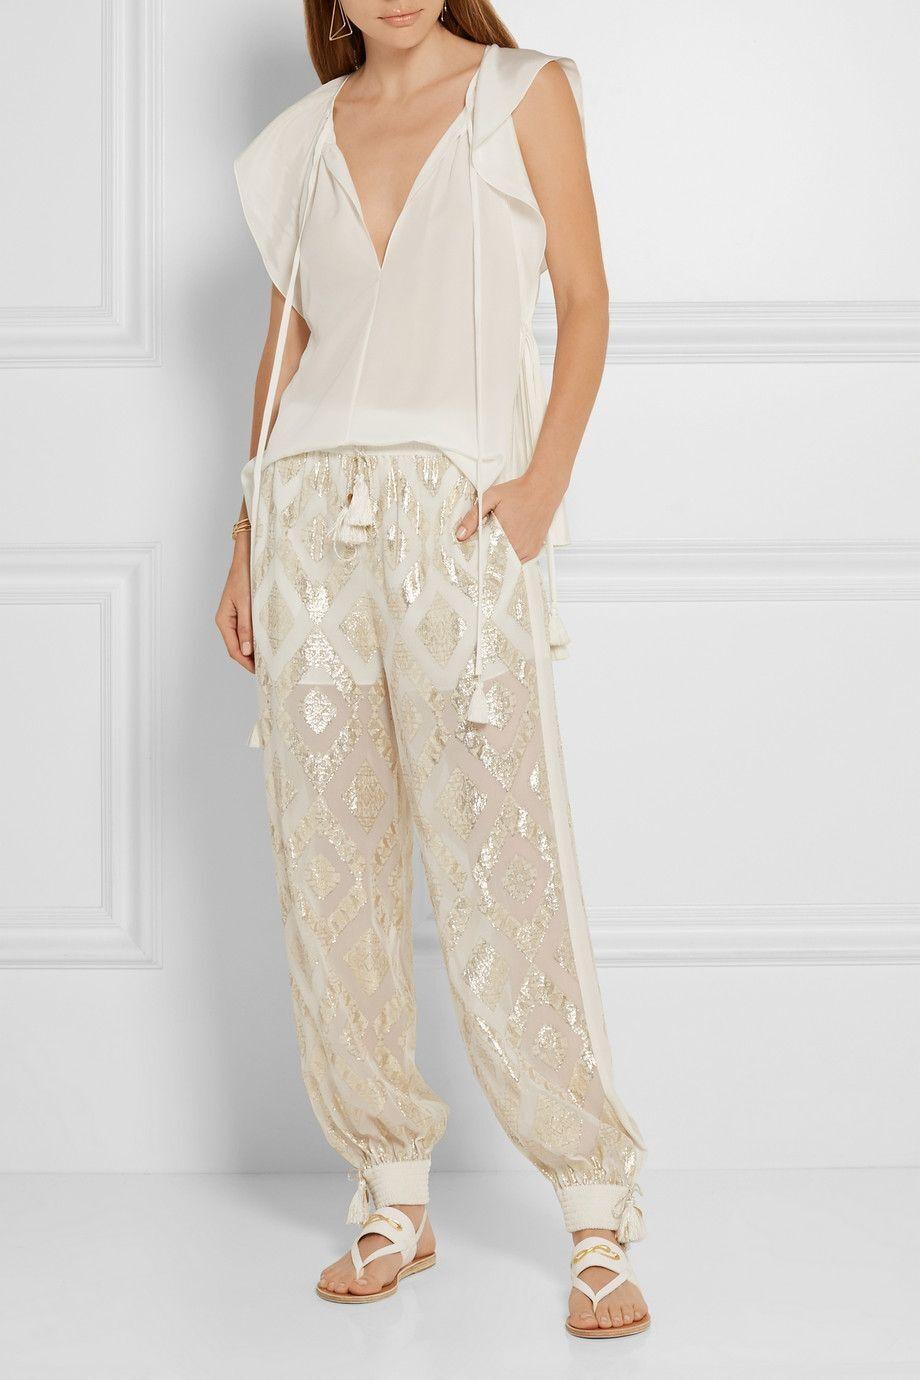 New Rachel Zoe Metallic Fil Coup Silk Blend Wide Leg Pants Ivory Size XS  295